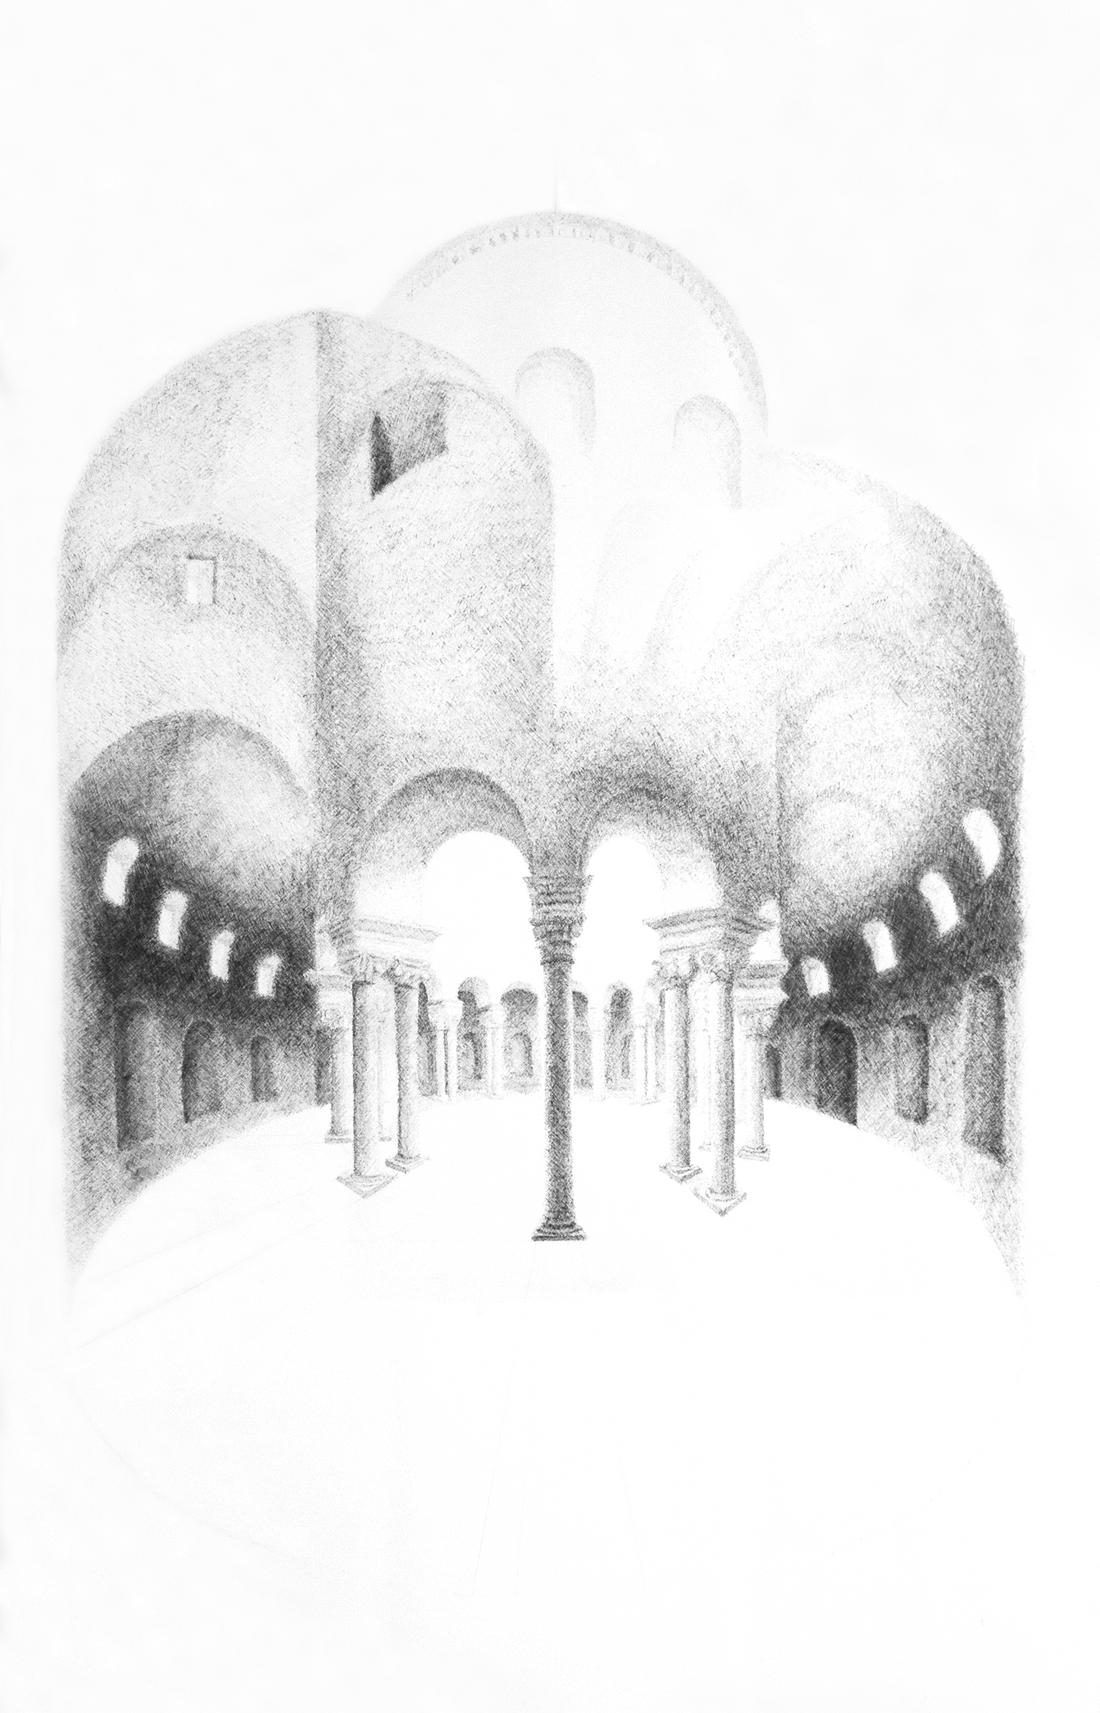 Drawing by Robert Yoos